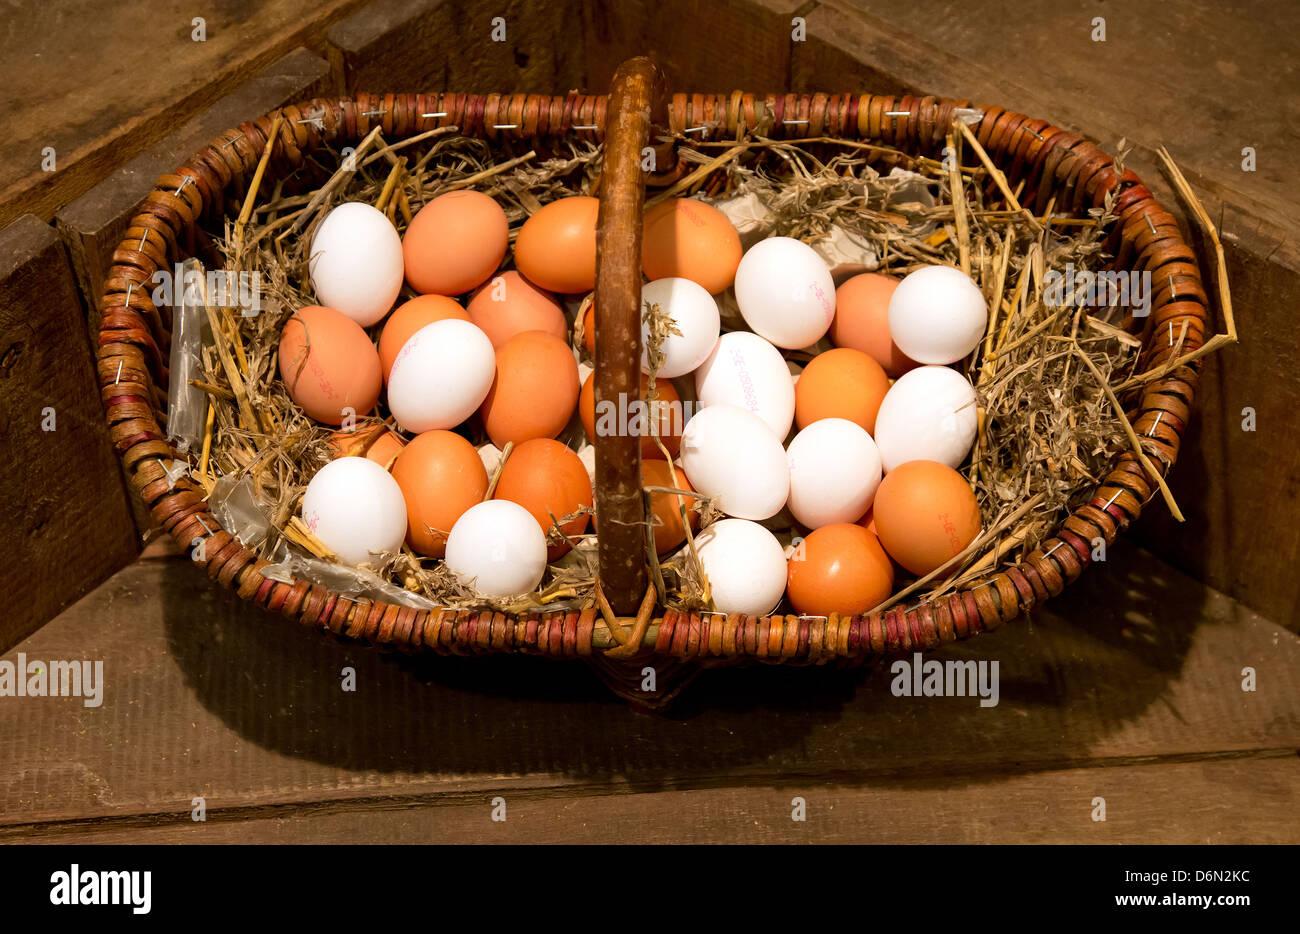 Herten, Germany shopping, eggs from the farm shop Stock Photo